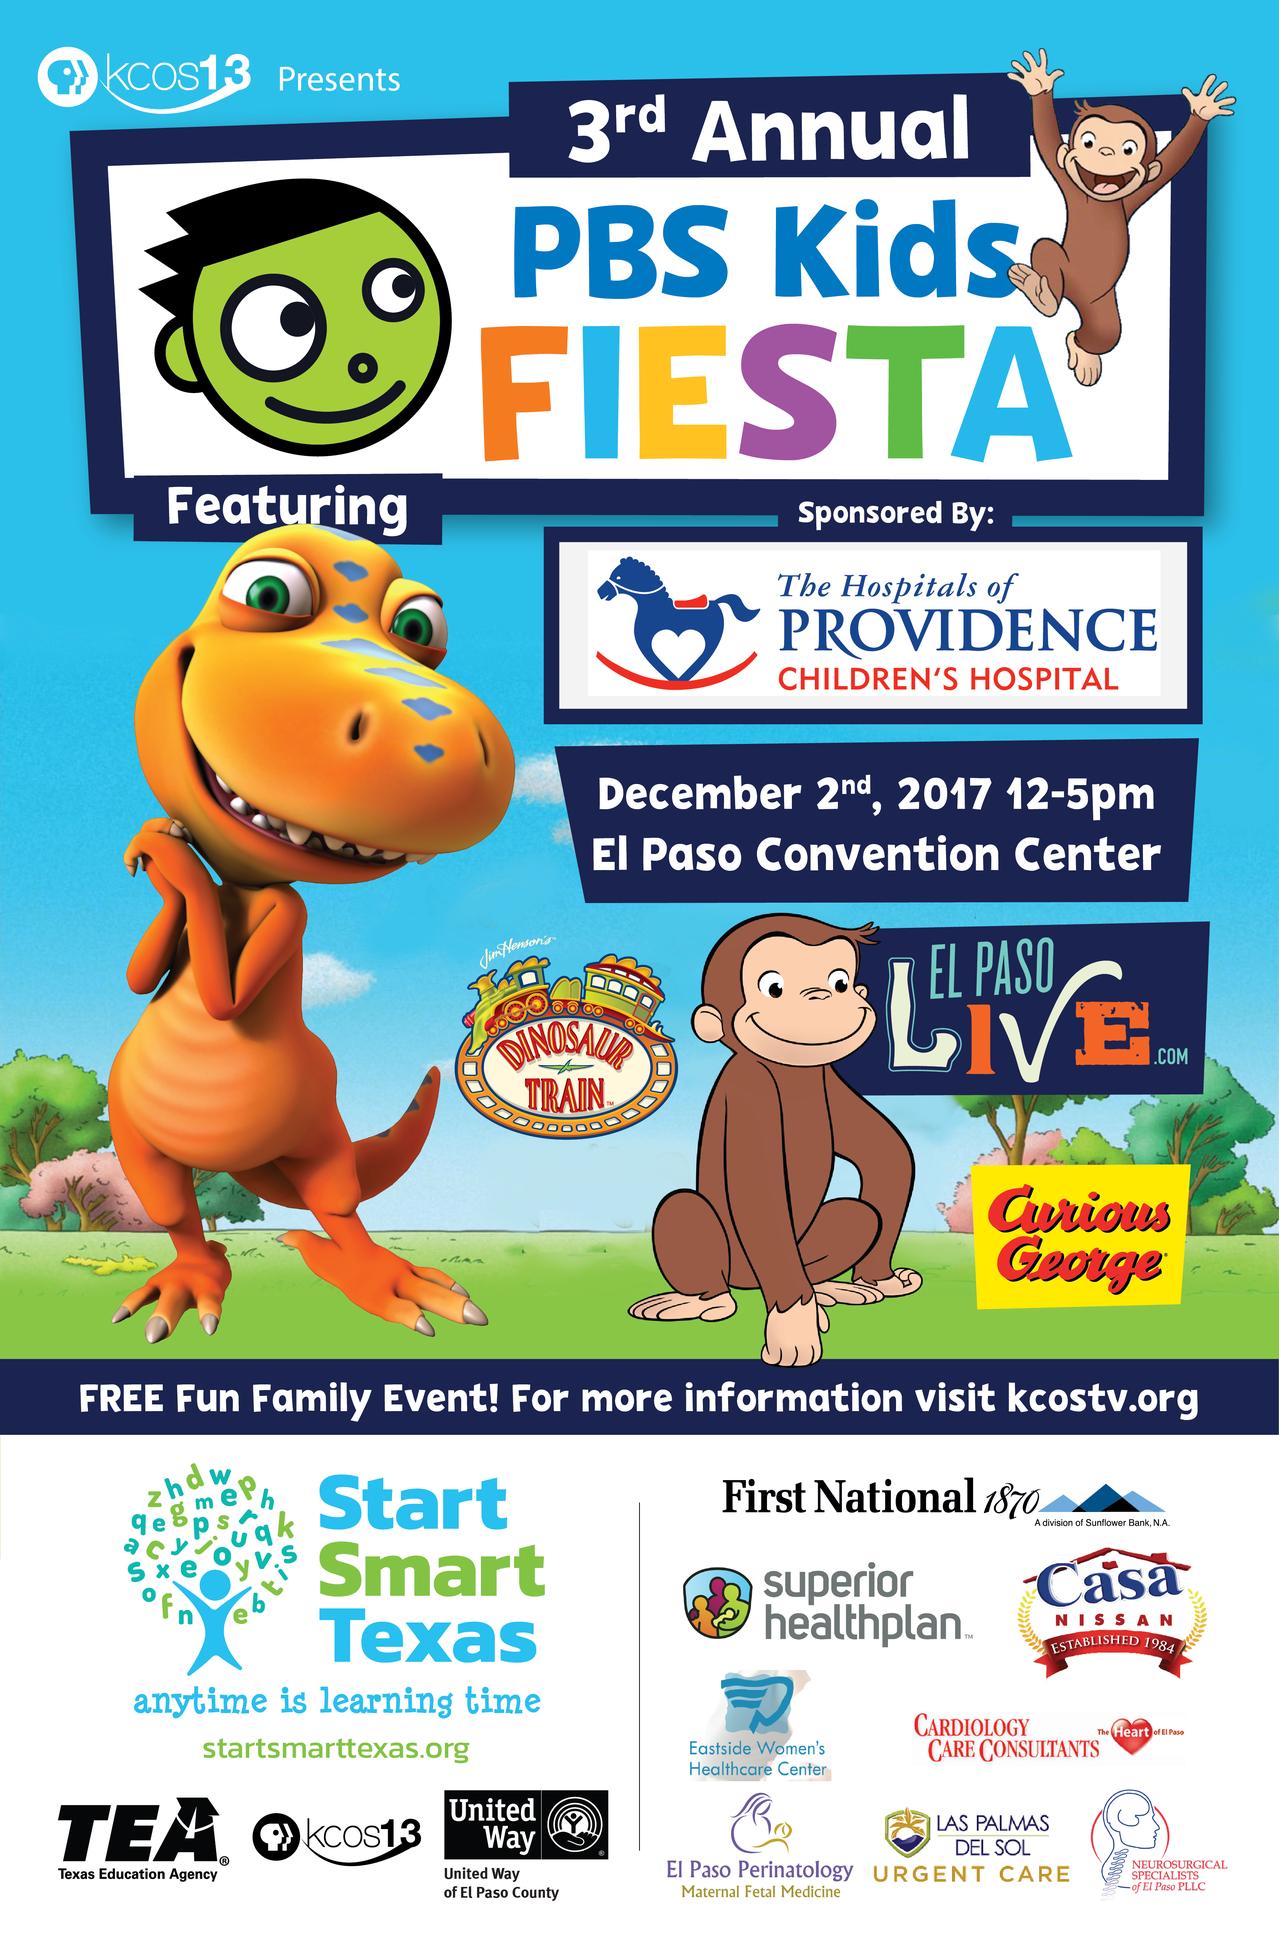 PBS Kids Fiesta Poster 2017 v04 web-02-01.png